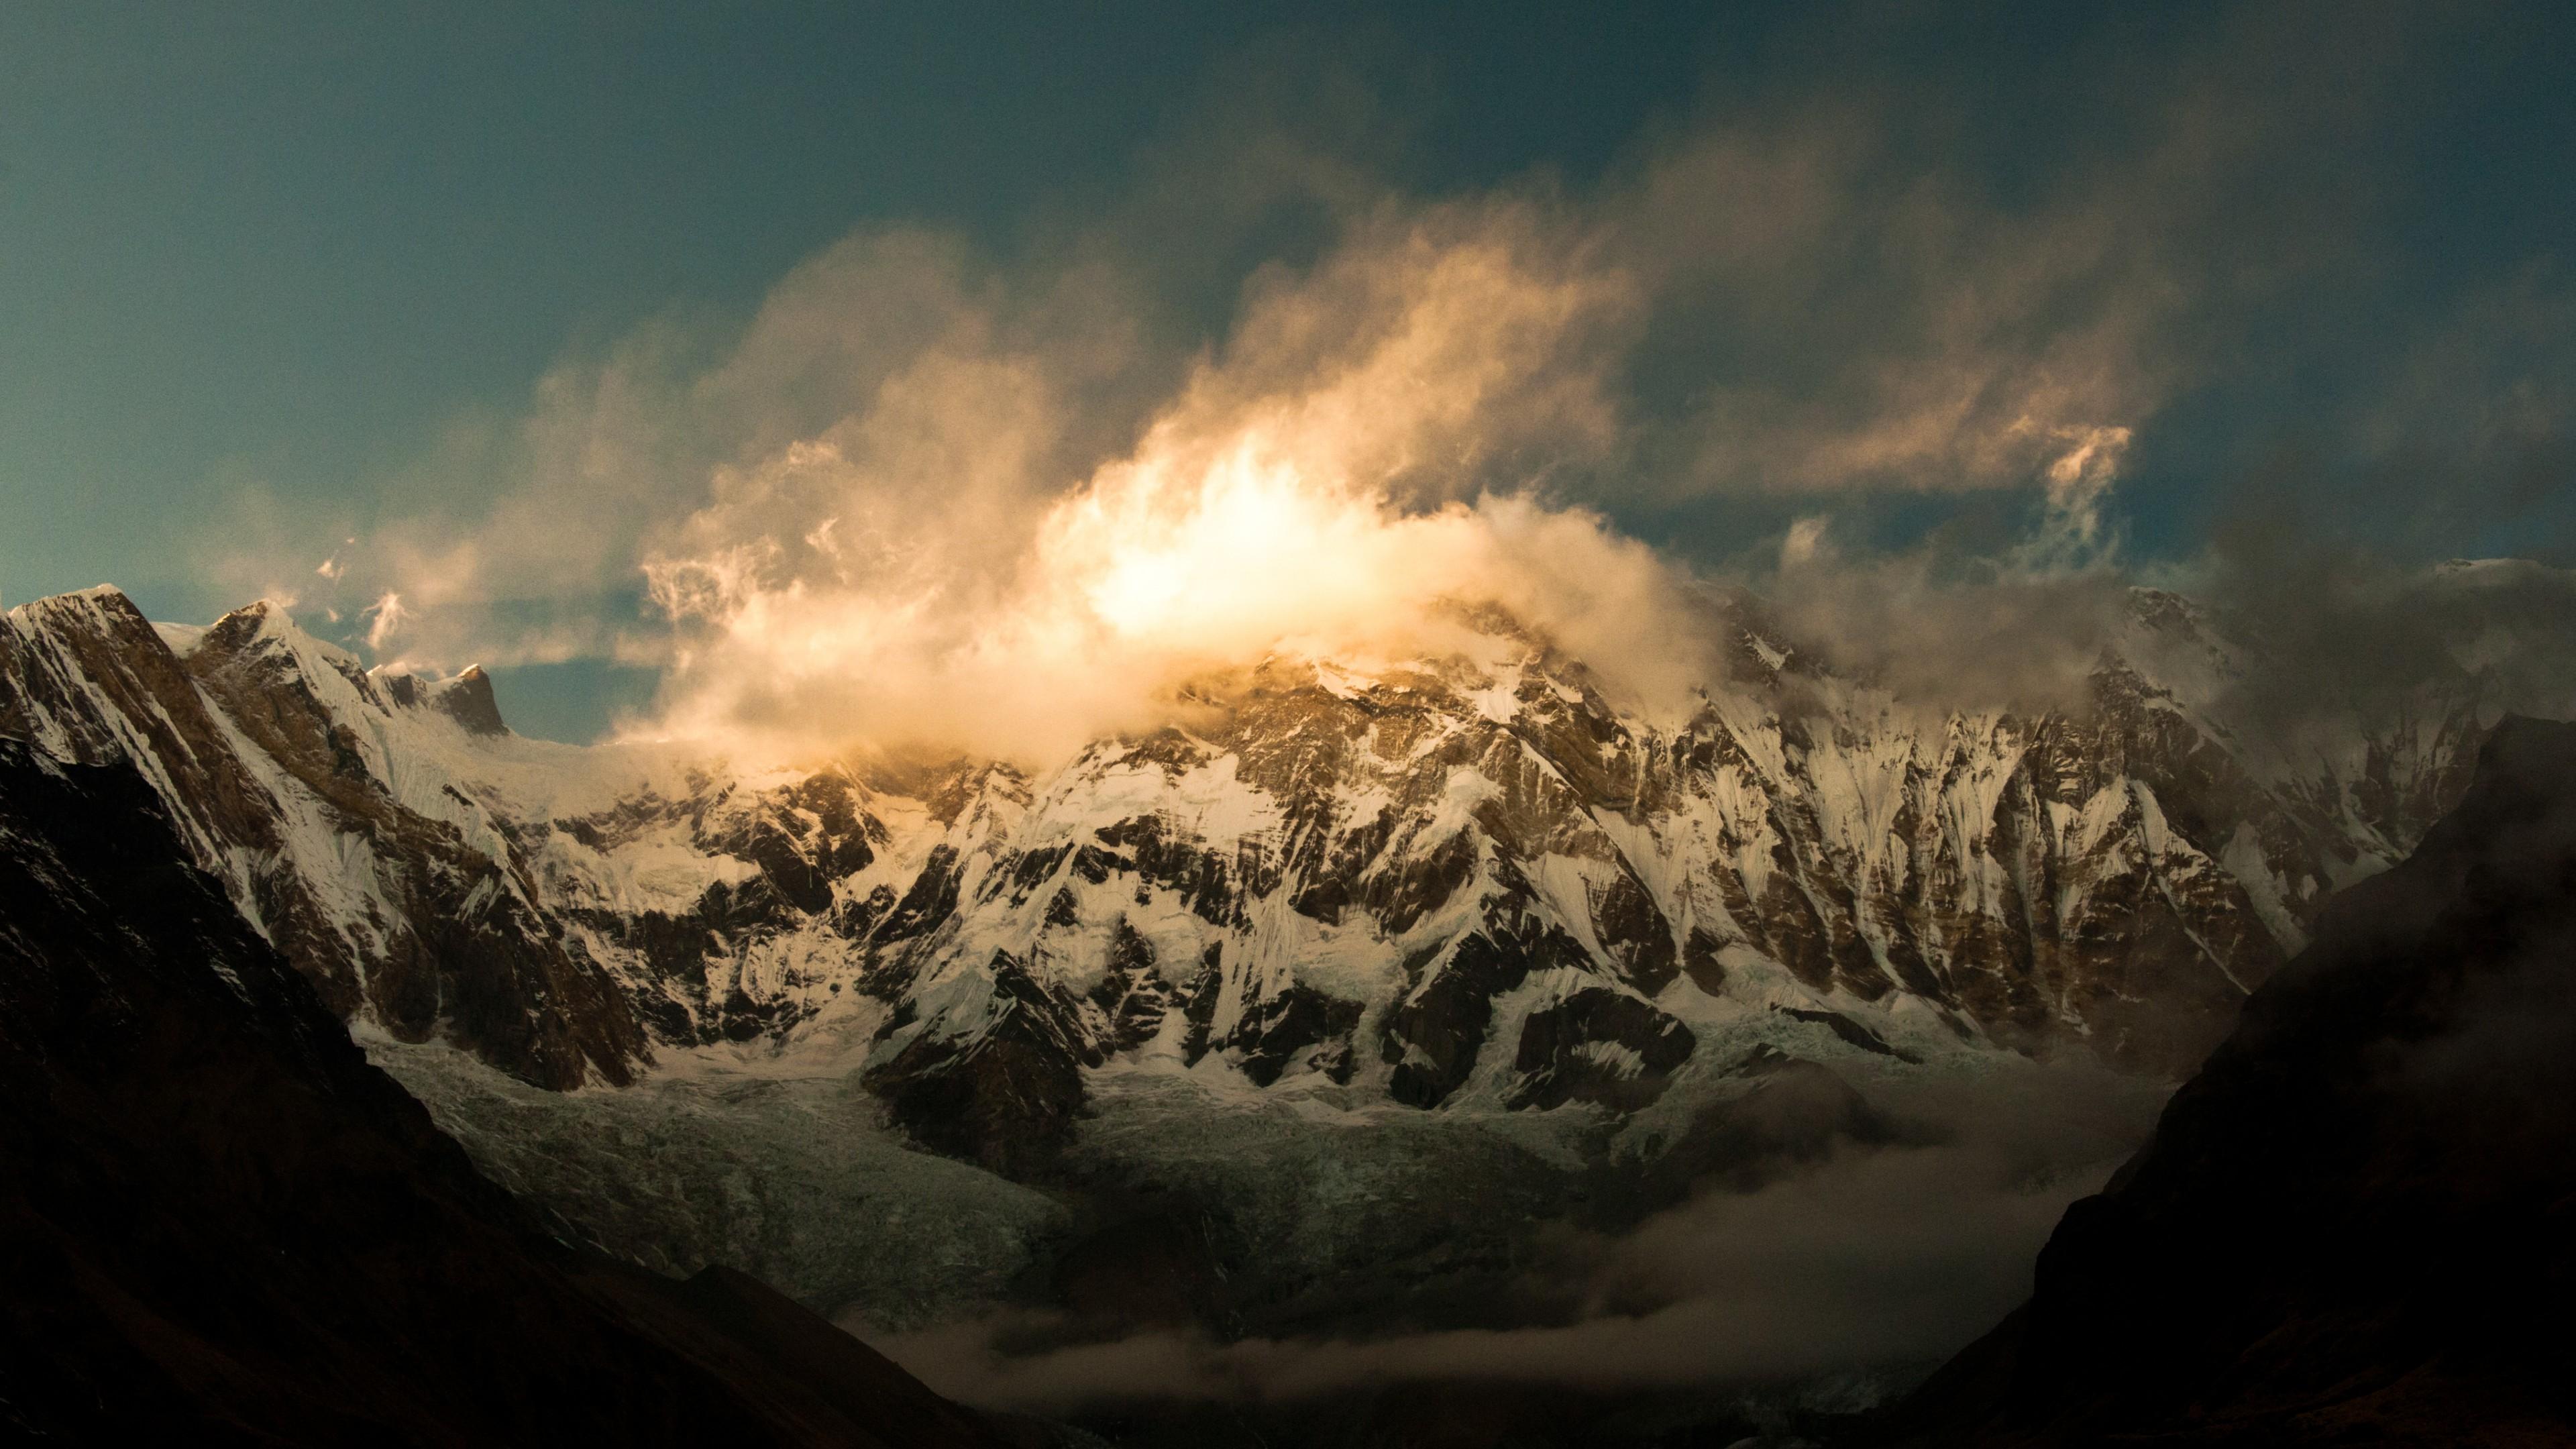 Luxury Cars Hd Wallpapers Download Wallpaper Annapurna 5k 4k Wallpaper Himalayas Nepal